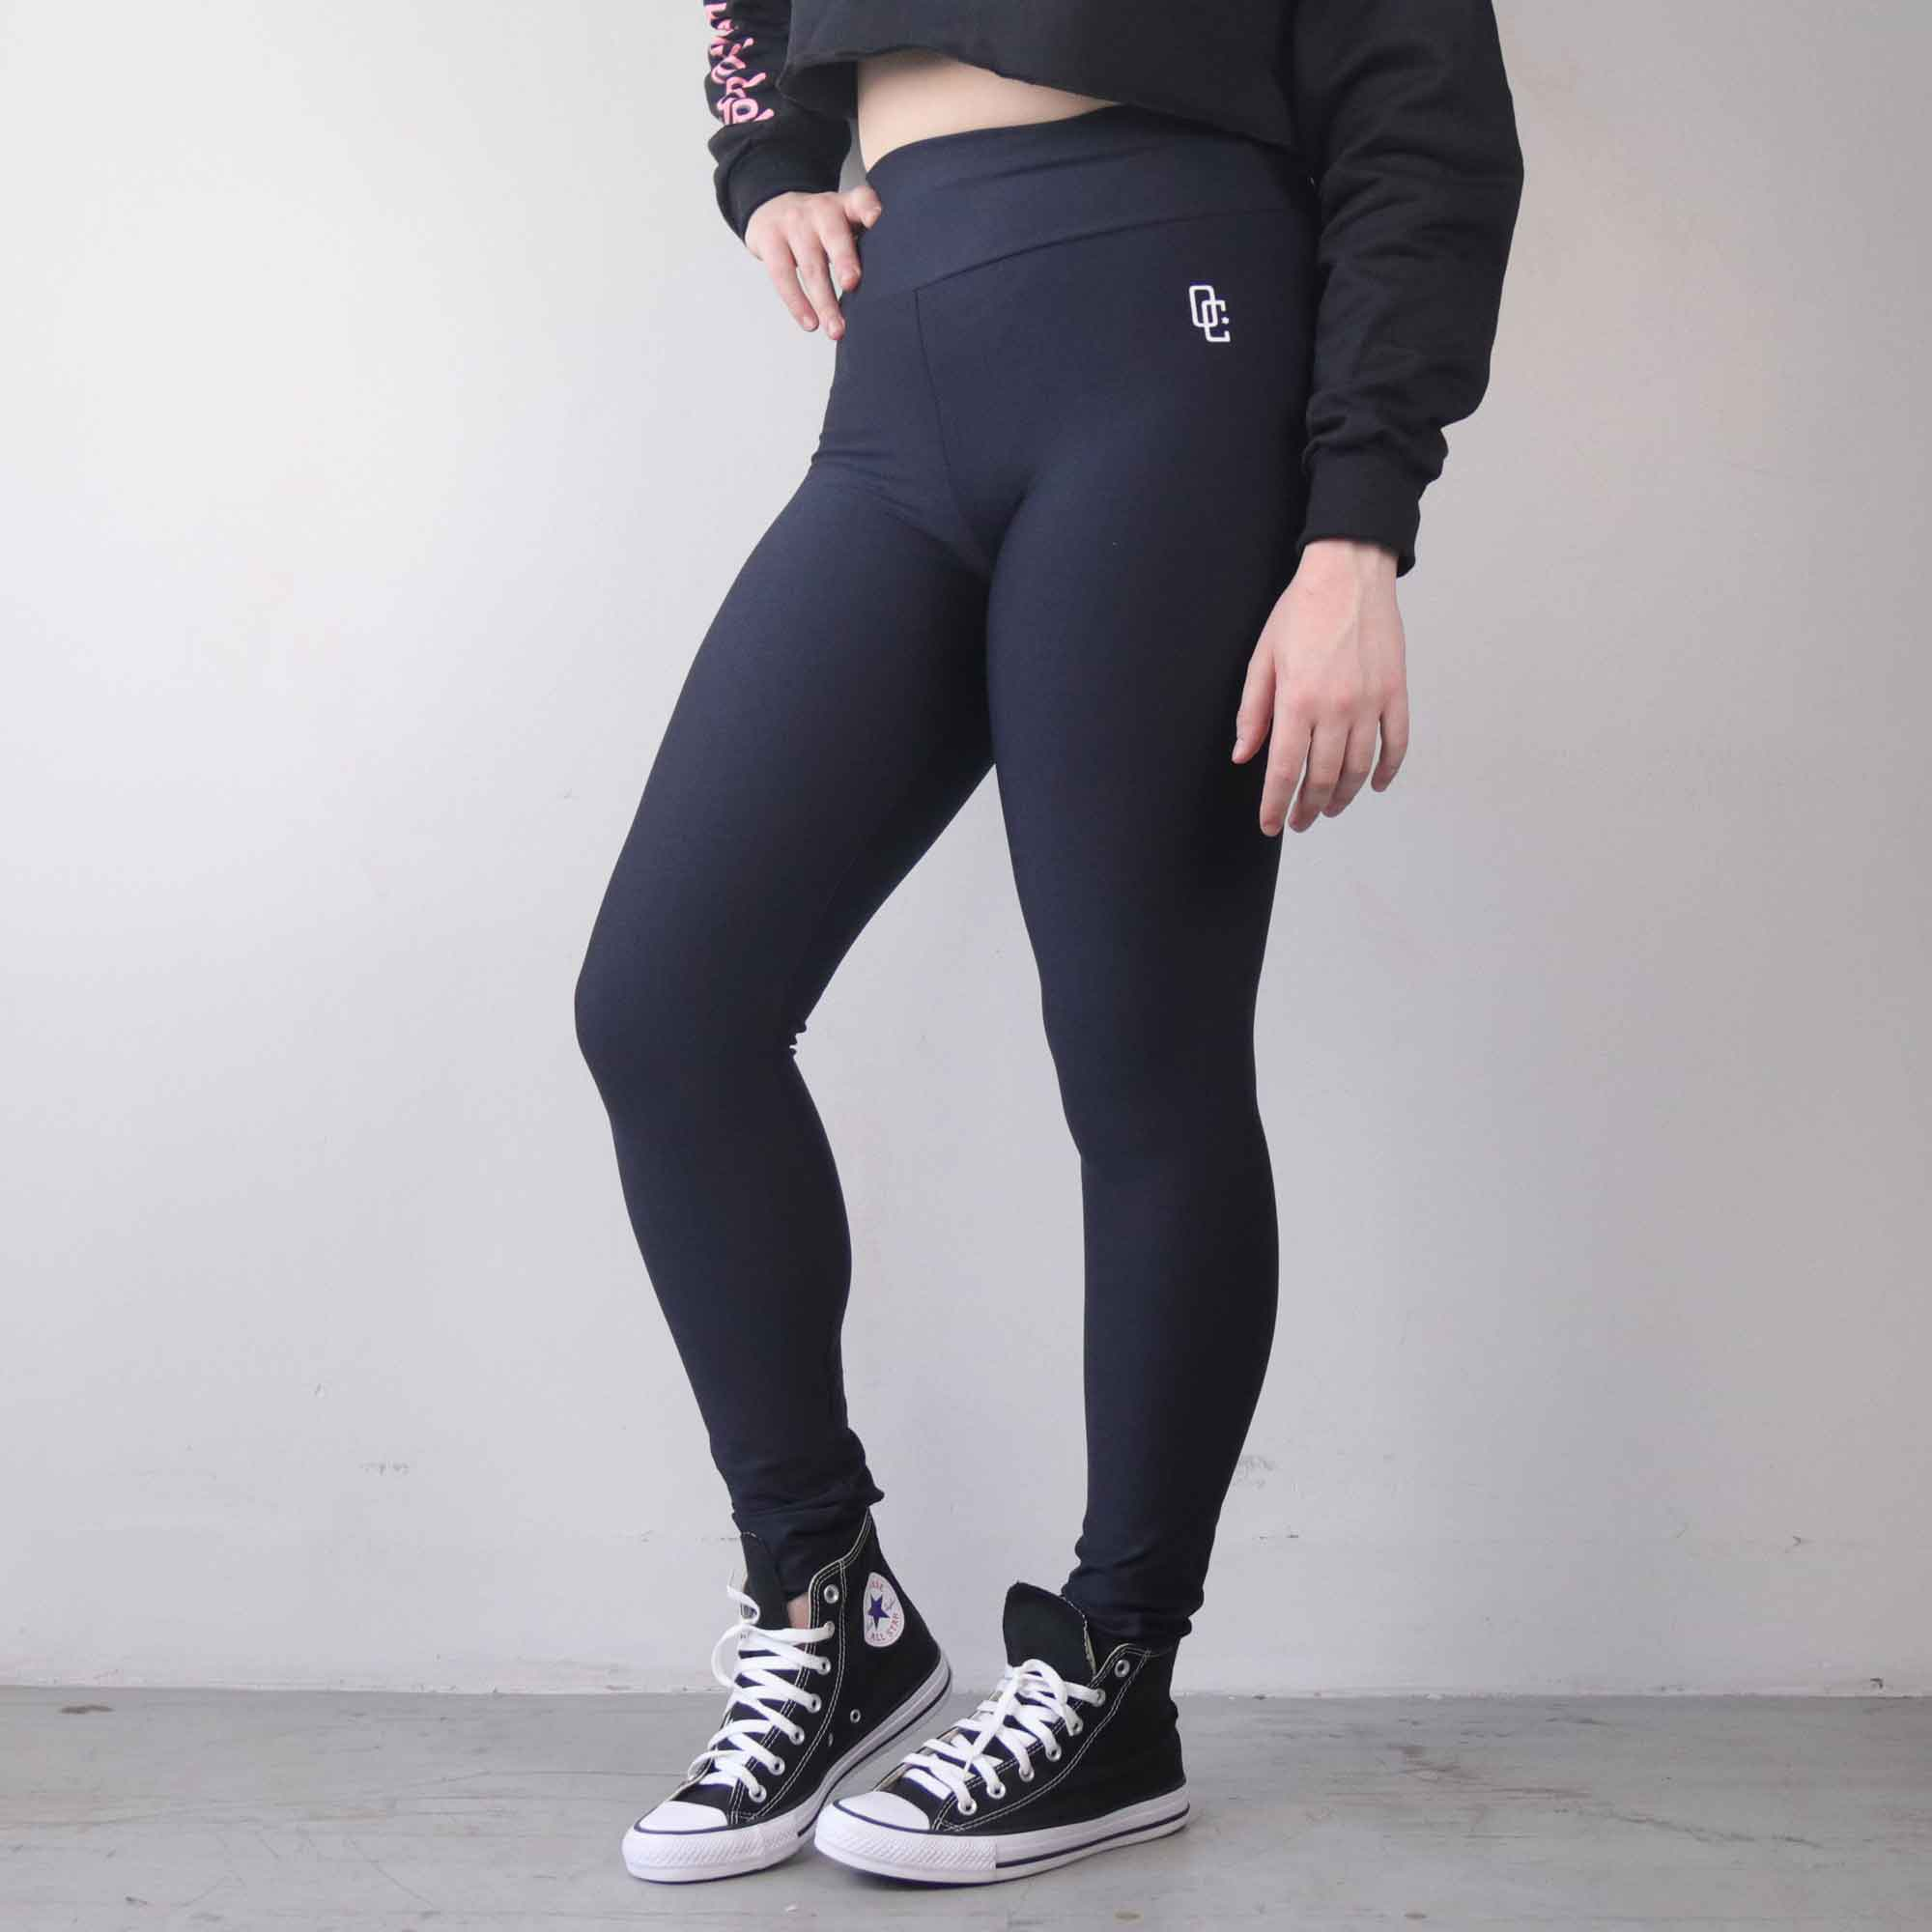 Calça Overcome Legging